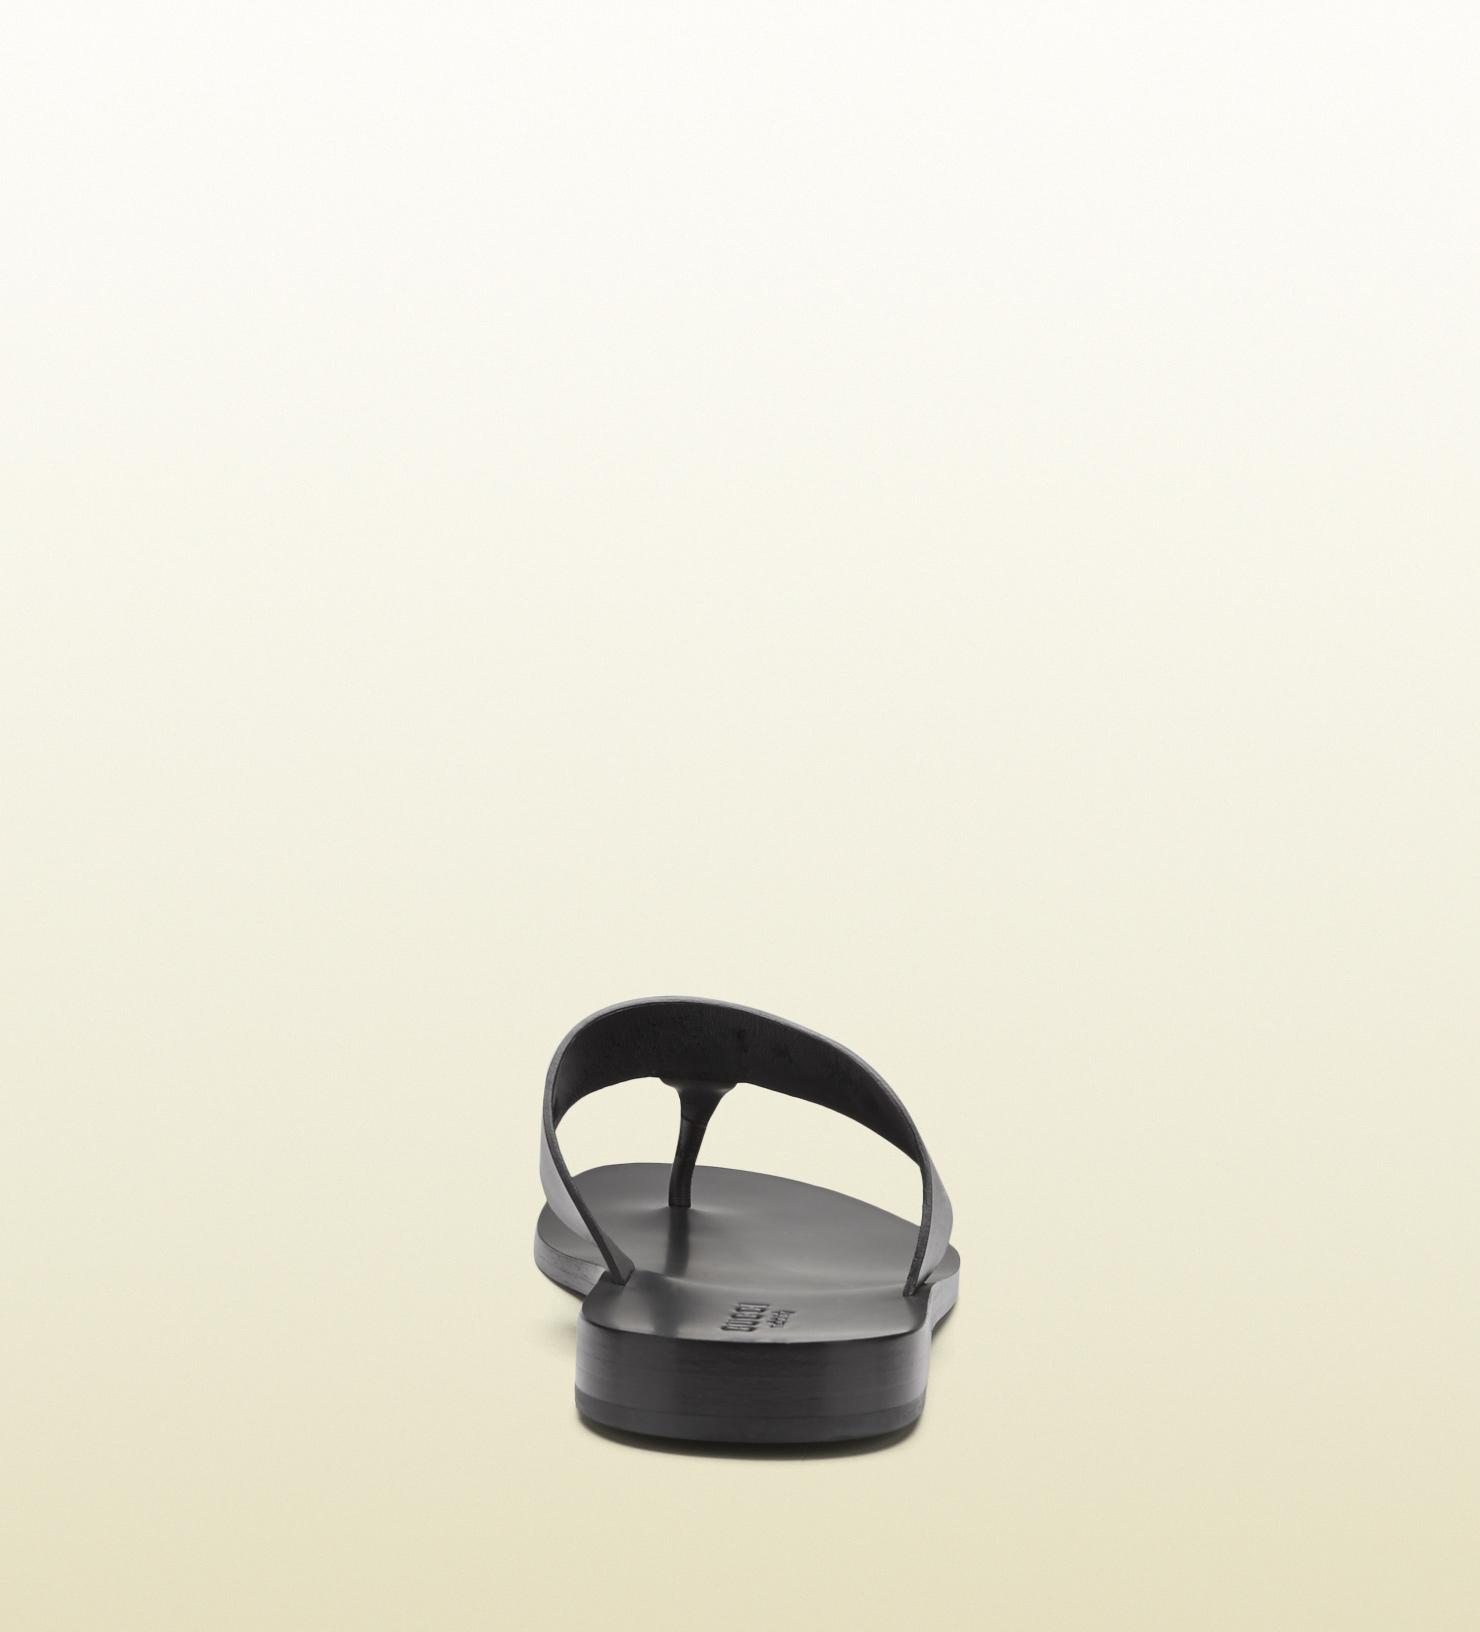 dbf612c35fe4 Lyst - Gucci Leather Horsebit Thong Sandal in Black